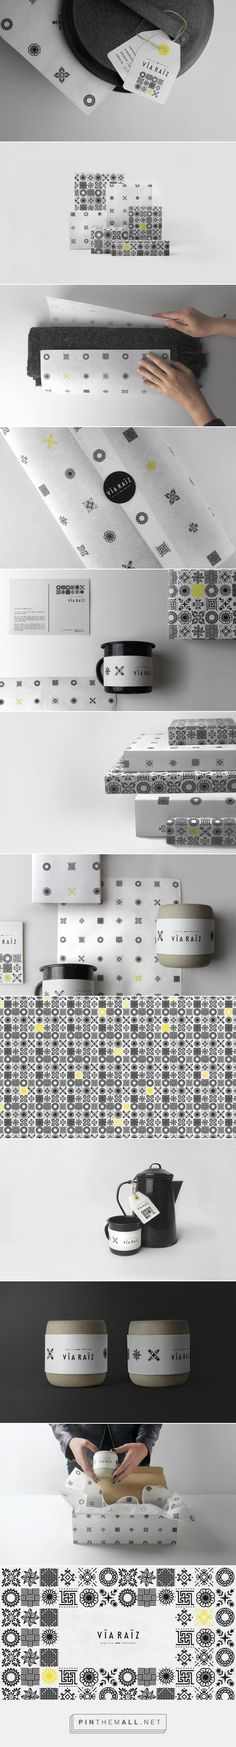 Vía Raíz craft products packaging design by TORO PINTO - http://www.packagingoftheworld.com/2017/03/via-raiz.html